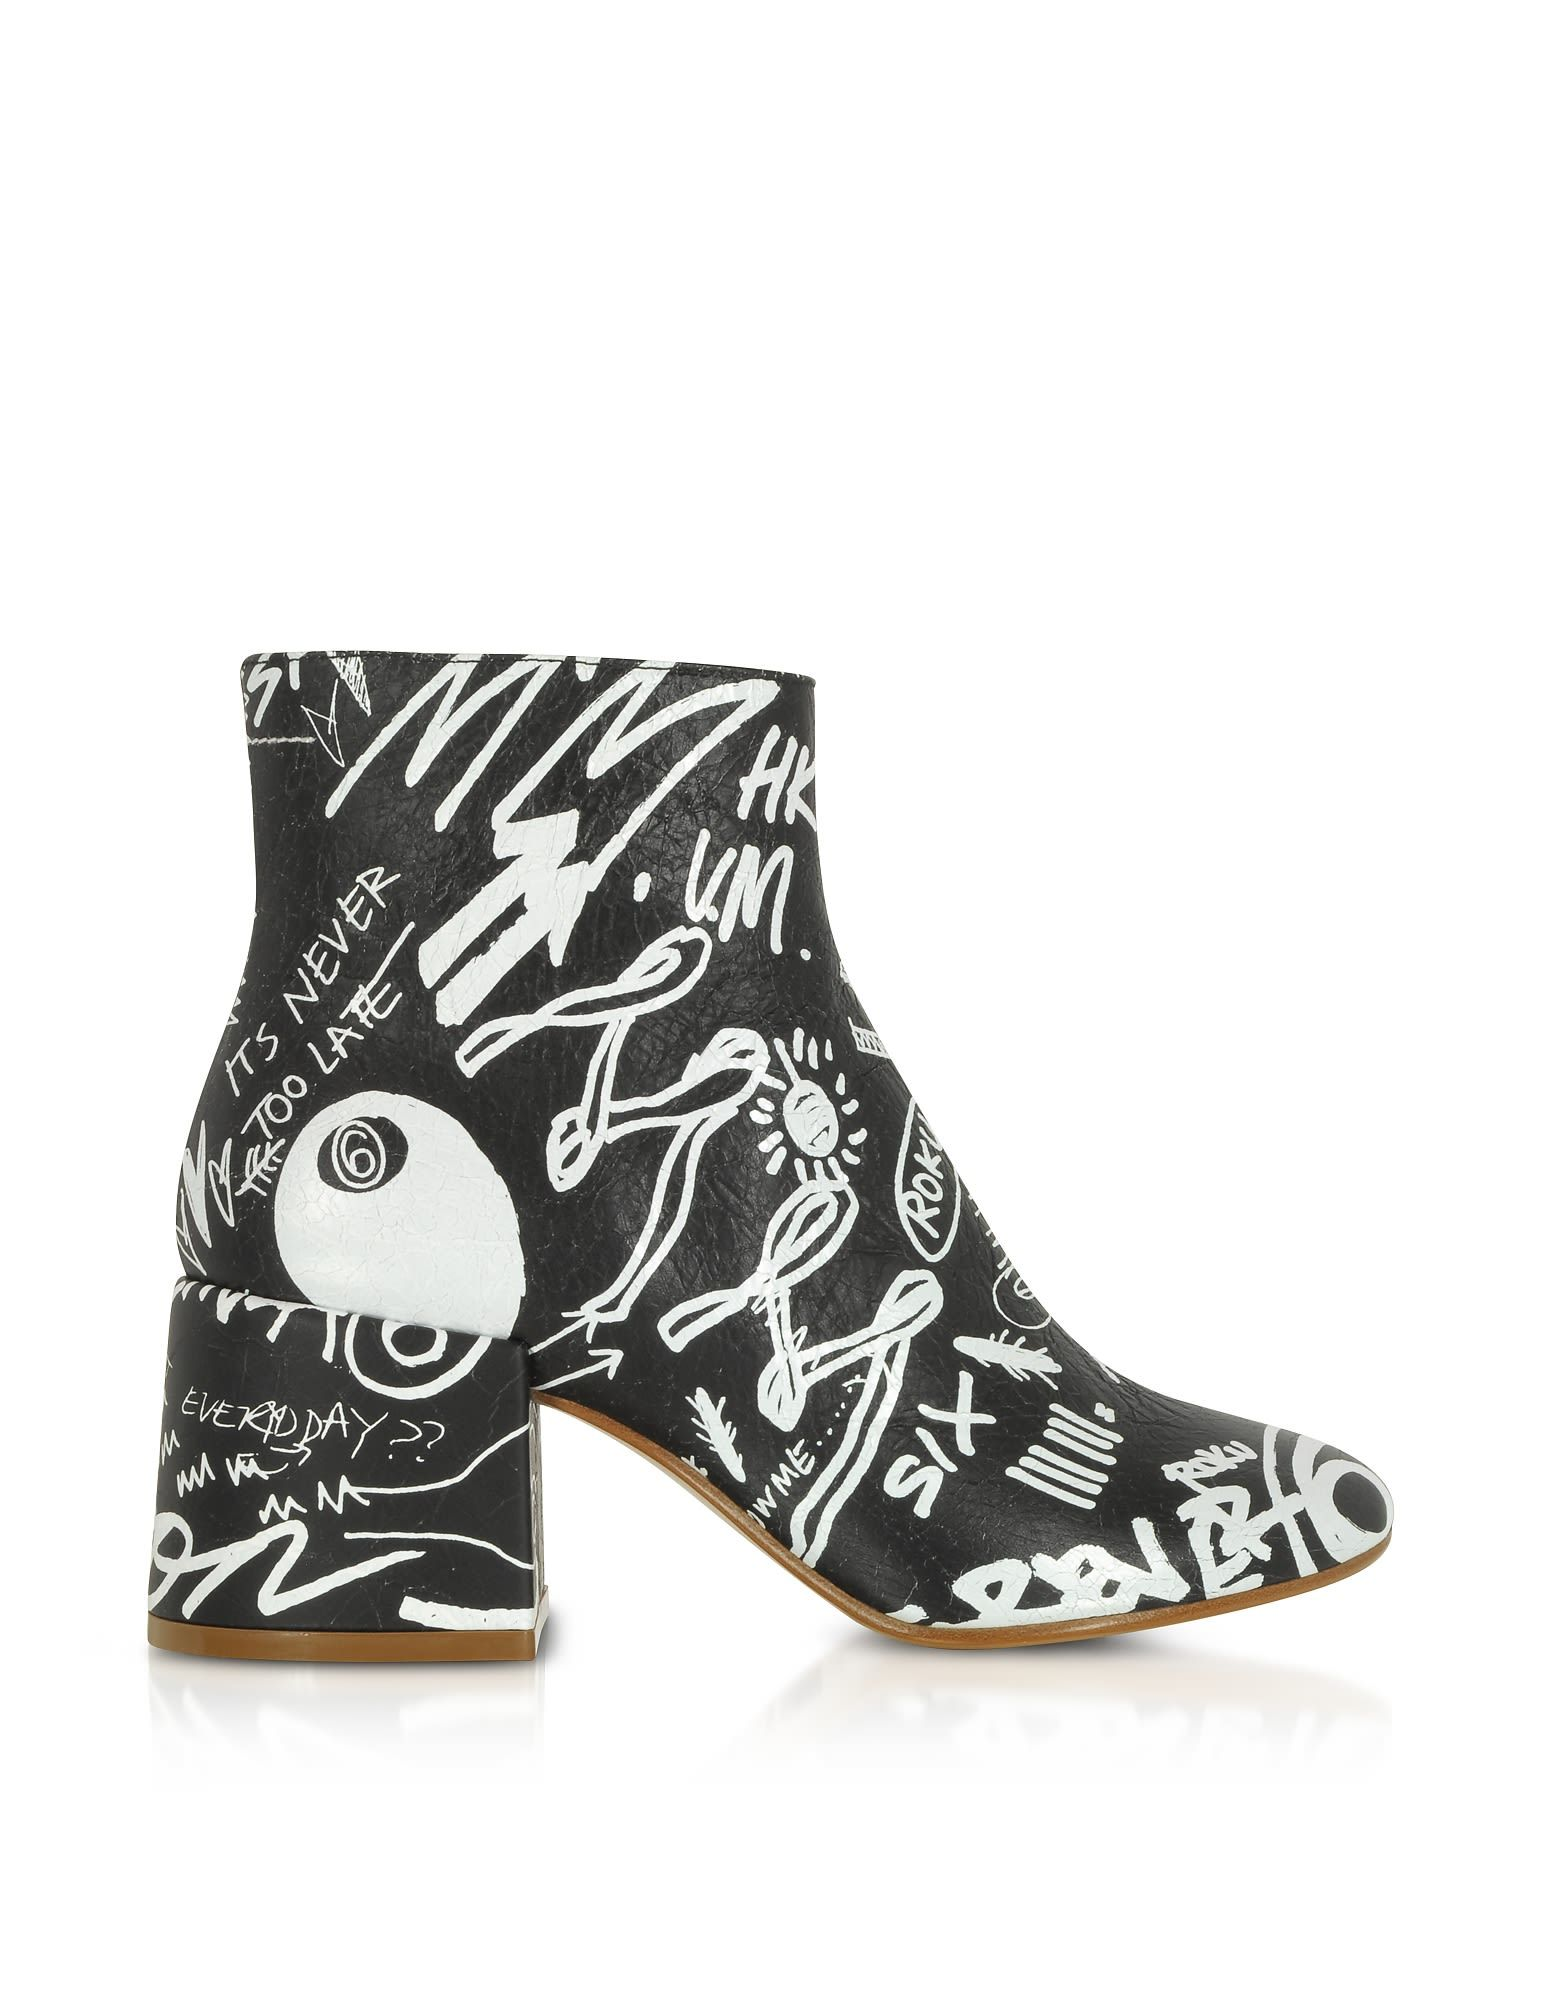 Maison Martin Margiela Designer Shoes, Crackled Graffiti Printed Leather Heel Boots